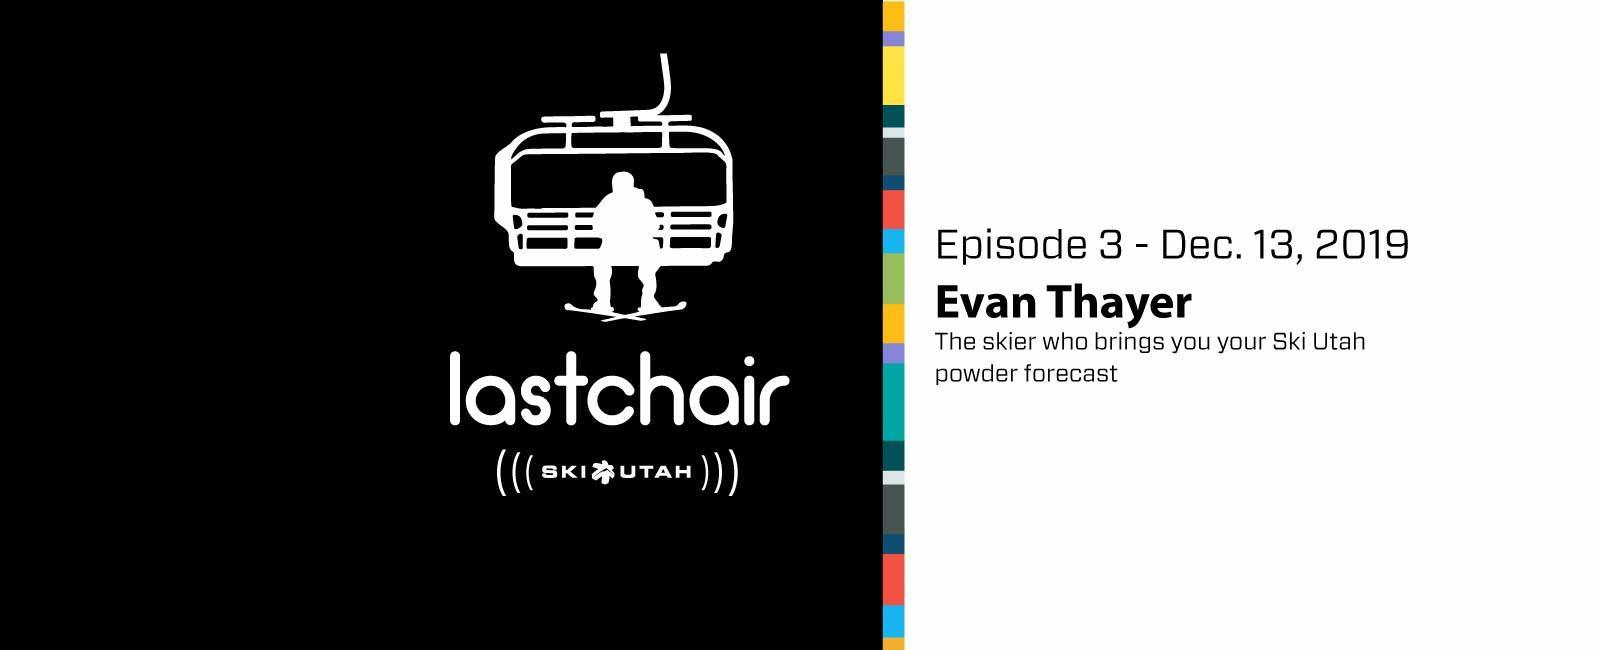 Evan Thayer: The skier who brings you your Ski Utah powder forecast